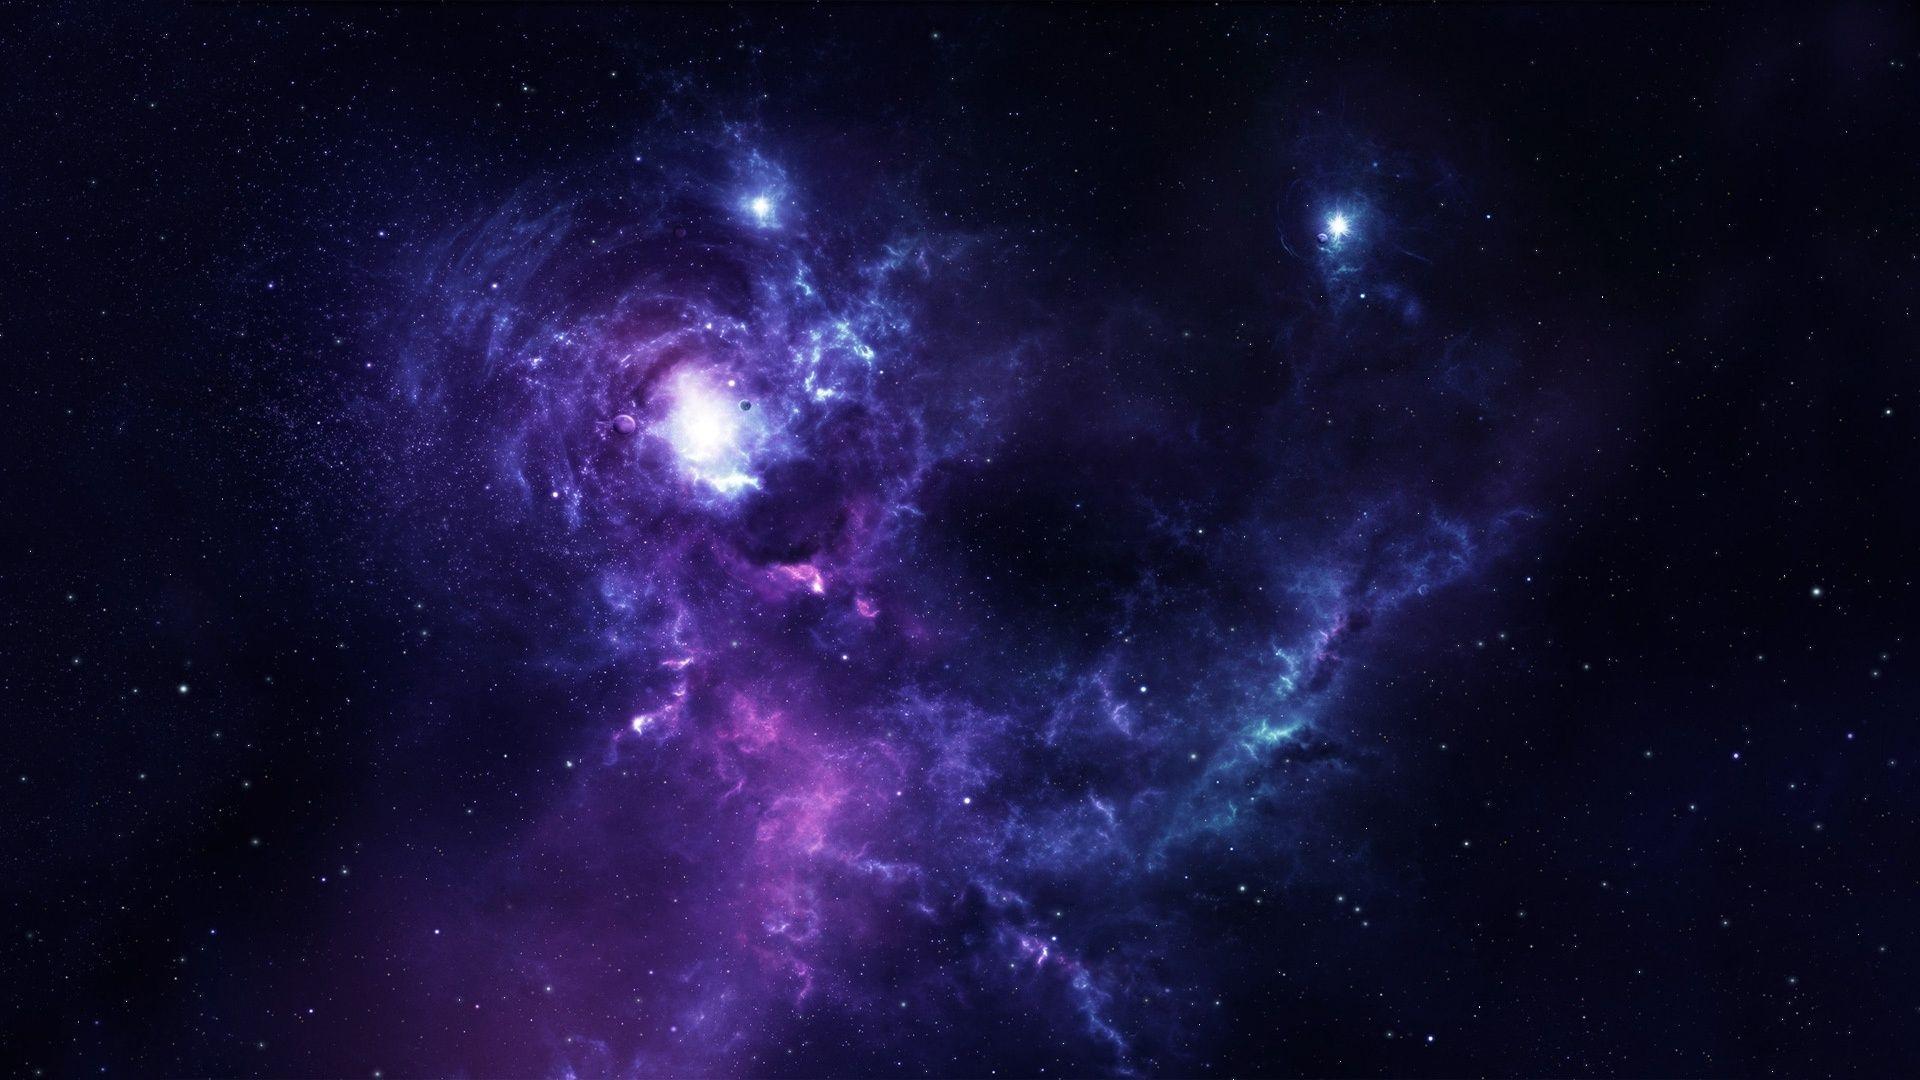 Space Nebula Hd Wallpaper 1920x1080 Via Classy Bro Nebula Wallpaper Nebula Star Wallpaper